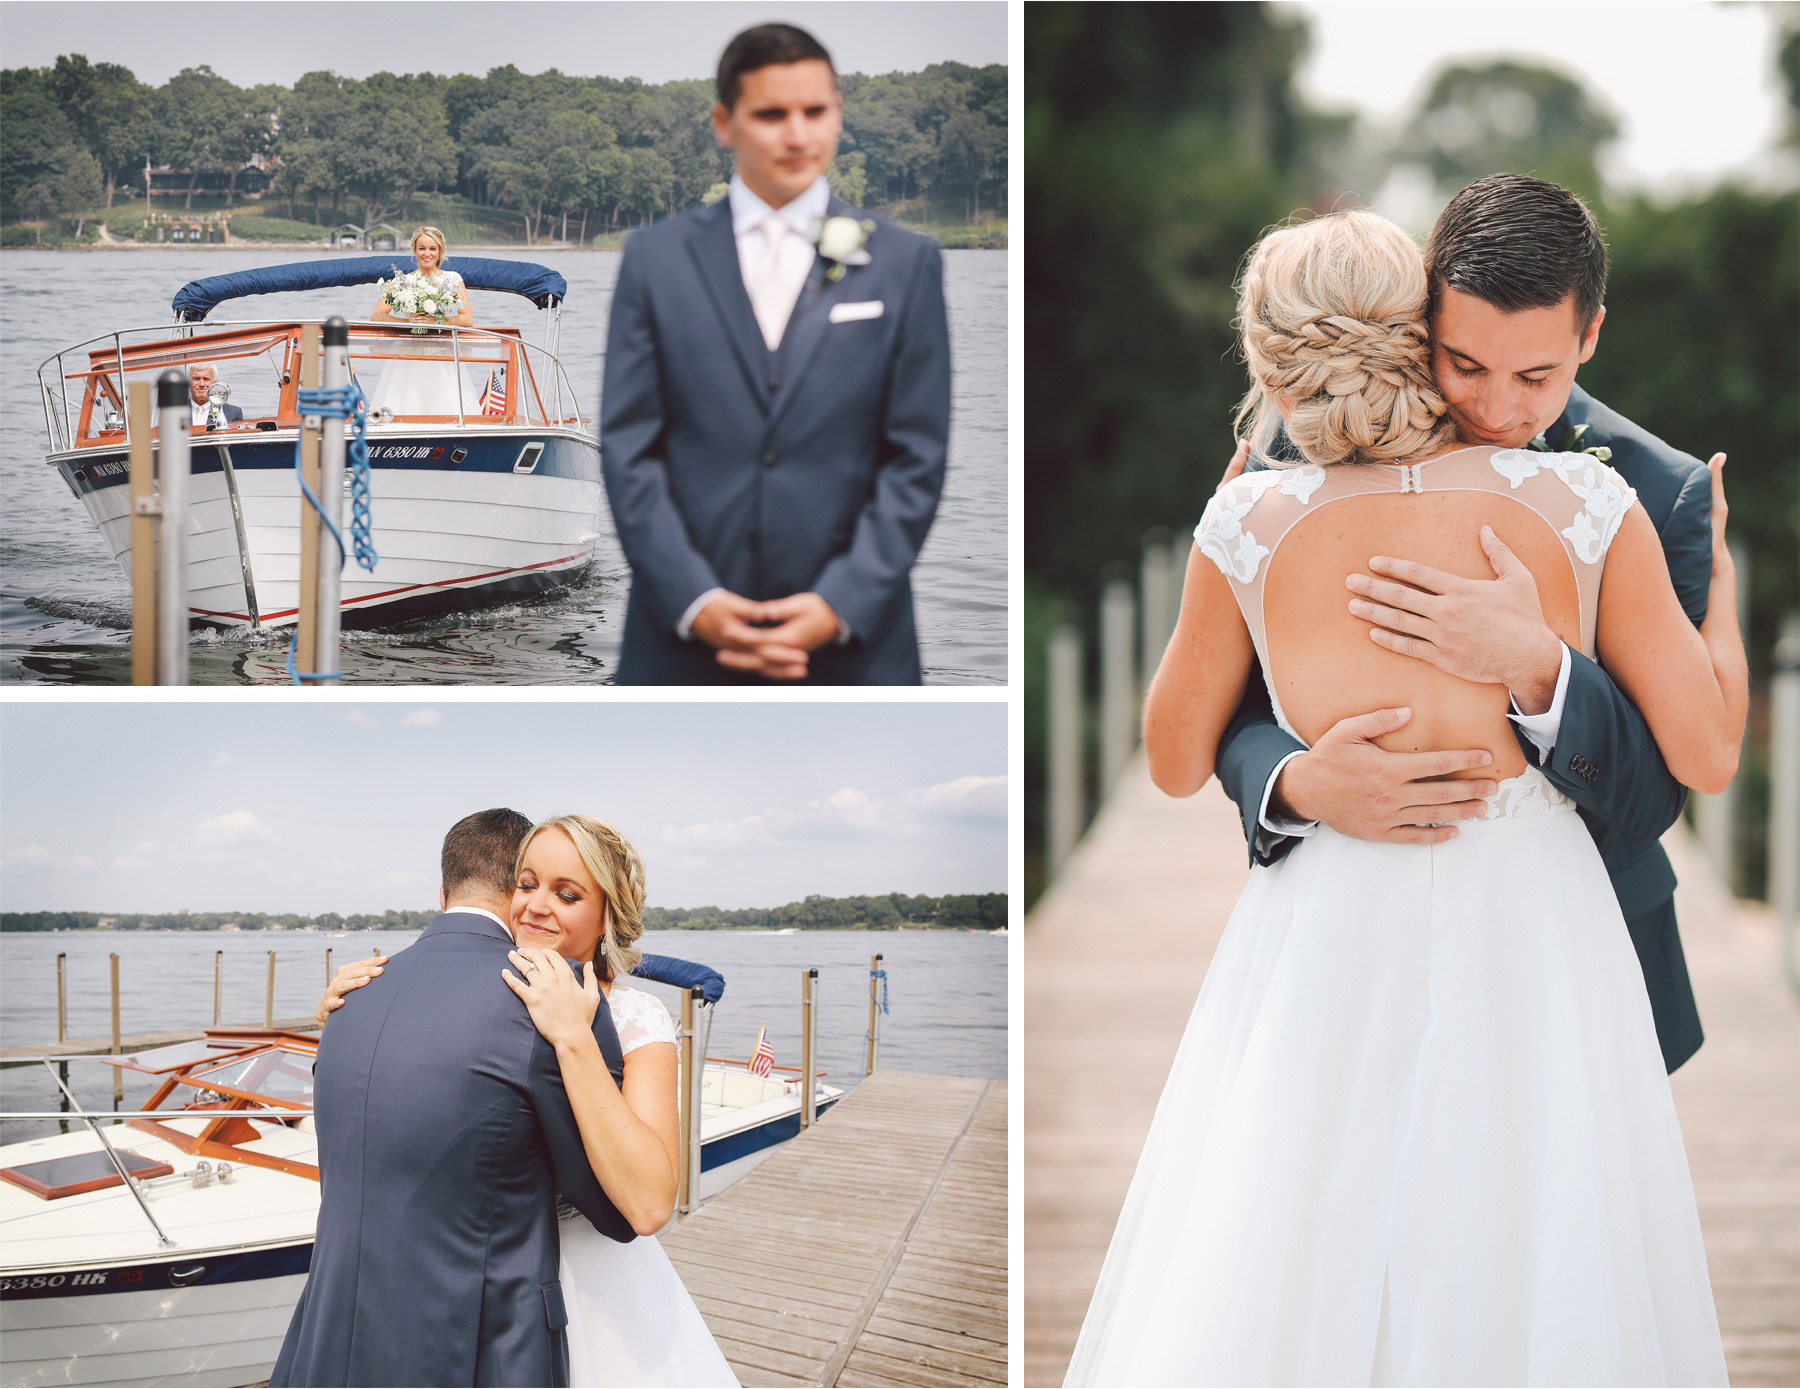 05-Minnetonka-Minnesota-Wedding-Photography-by-Vick-Photography-Boat-Lake-Minnetonka-First-Meeting-Jennifer-and-Adam.jpg